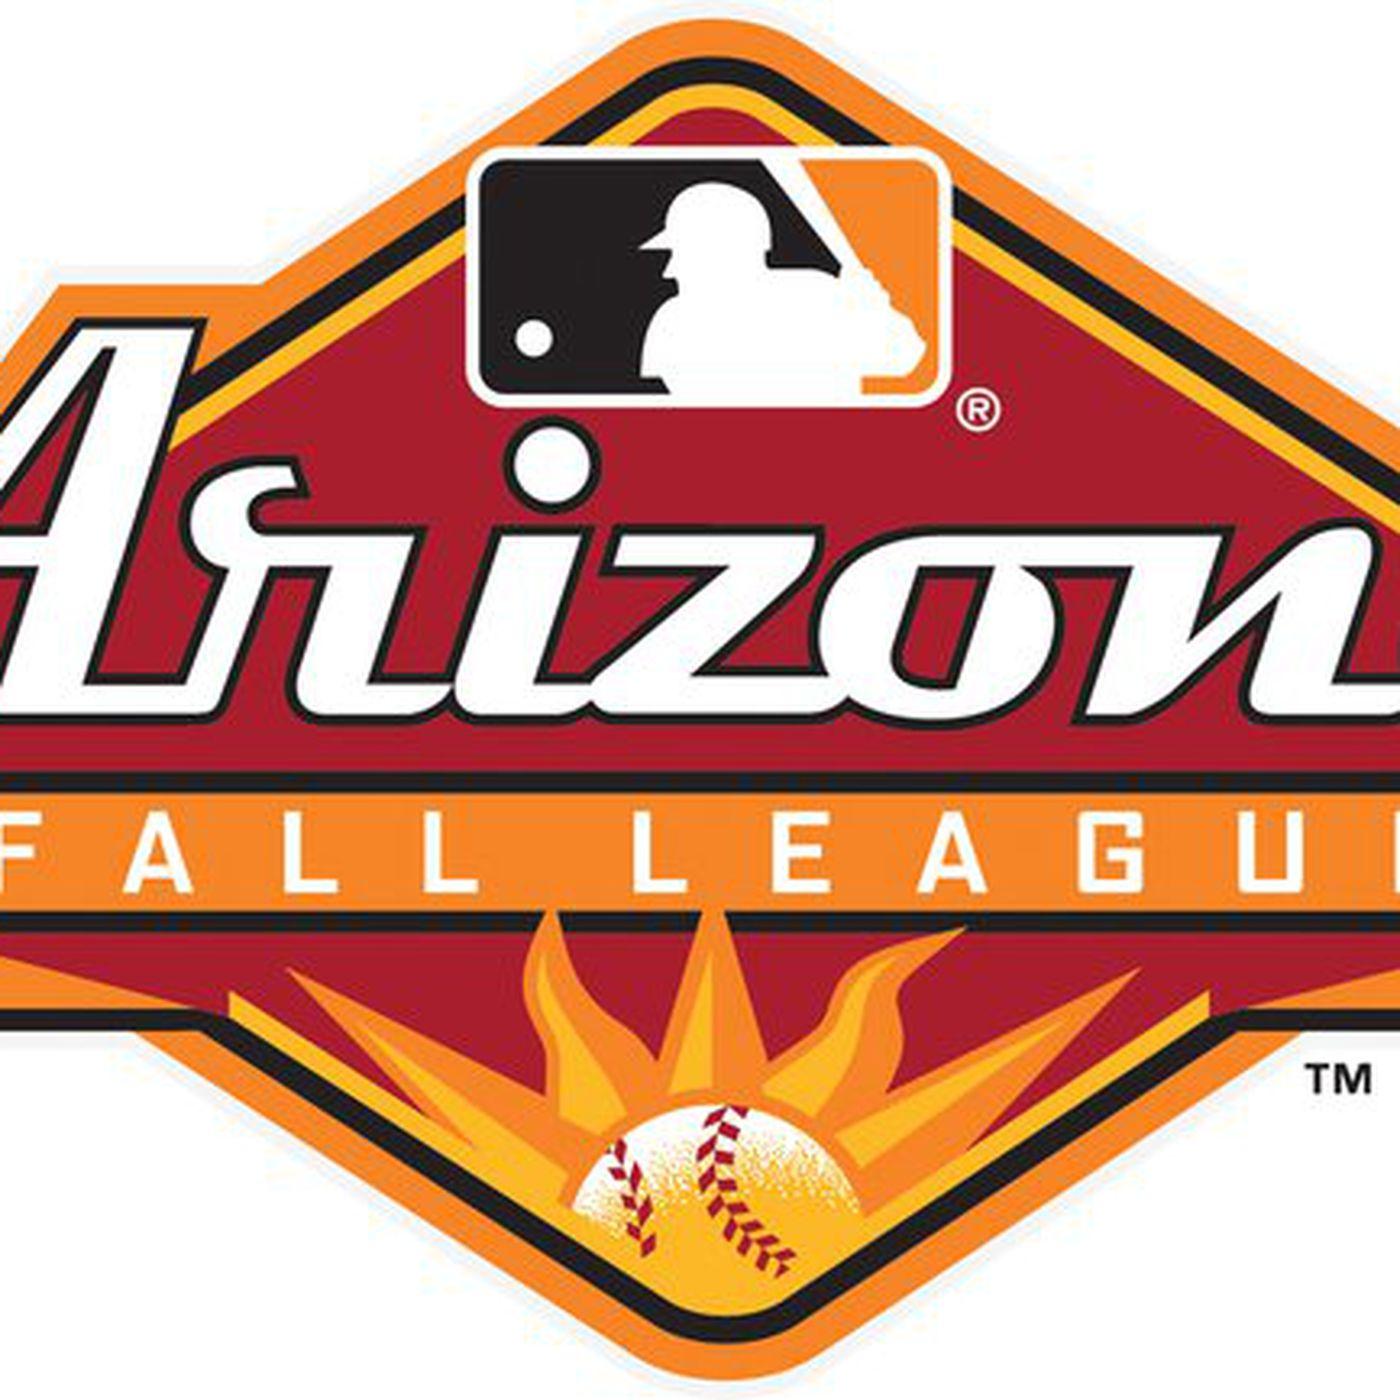 Arizona fall league clipart transparent 2014 Arizona Fall League Fall Stars Rosters and Stats - Minor League ... transparent